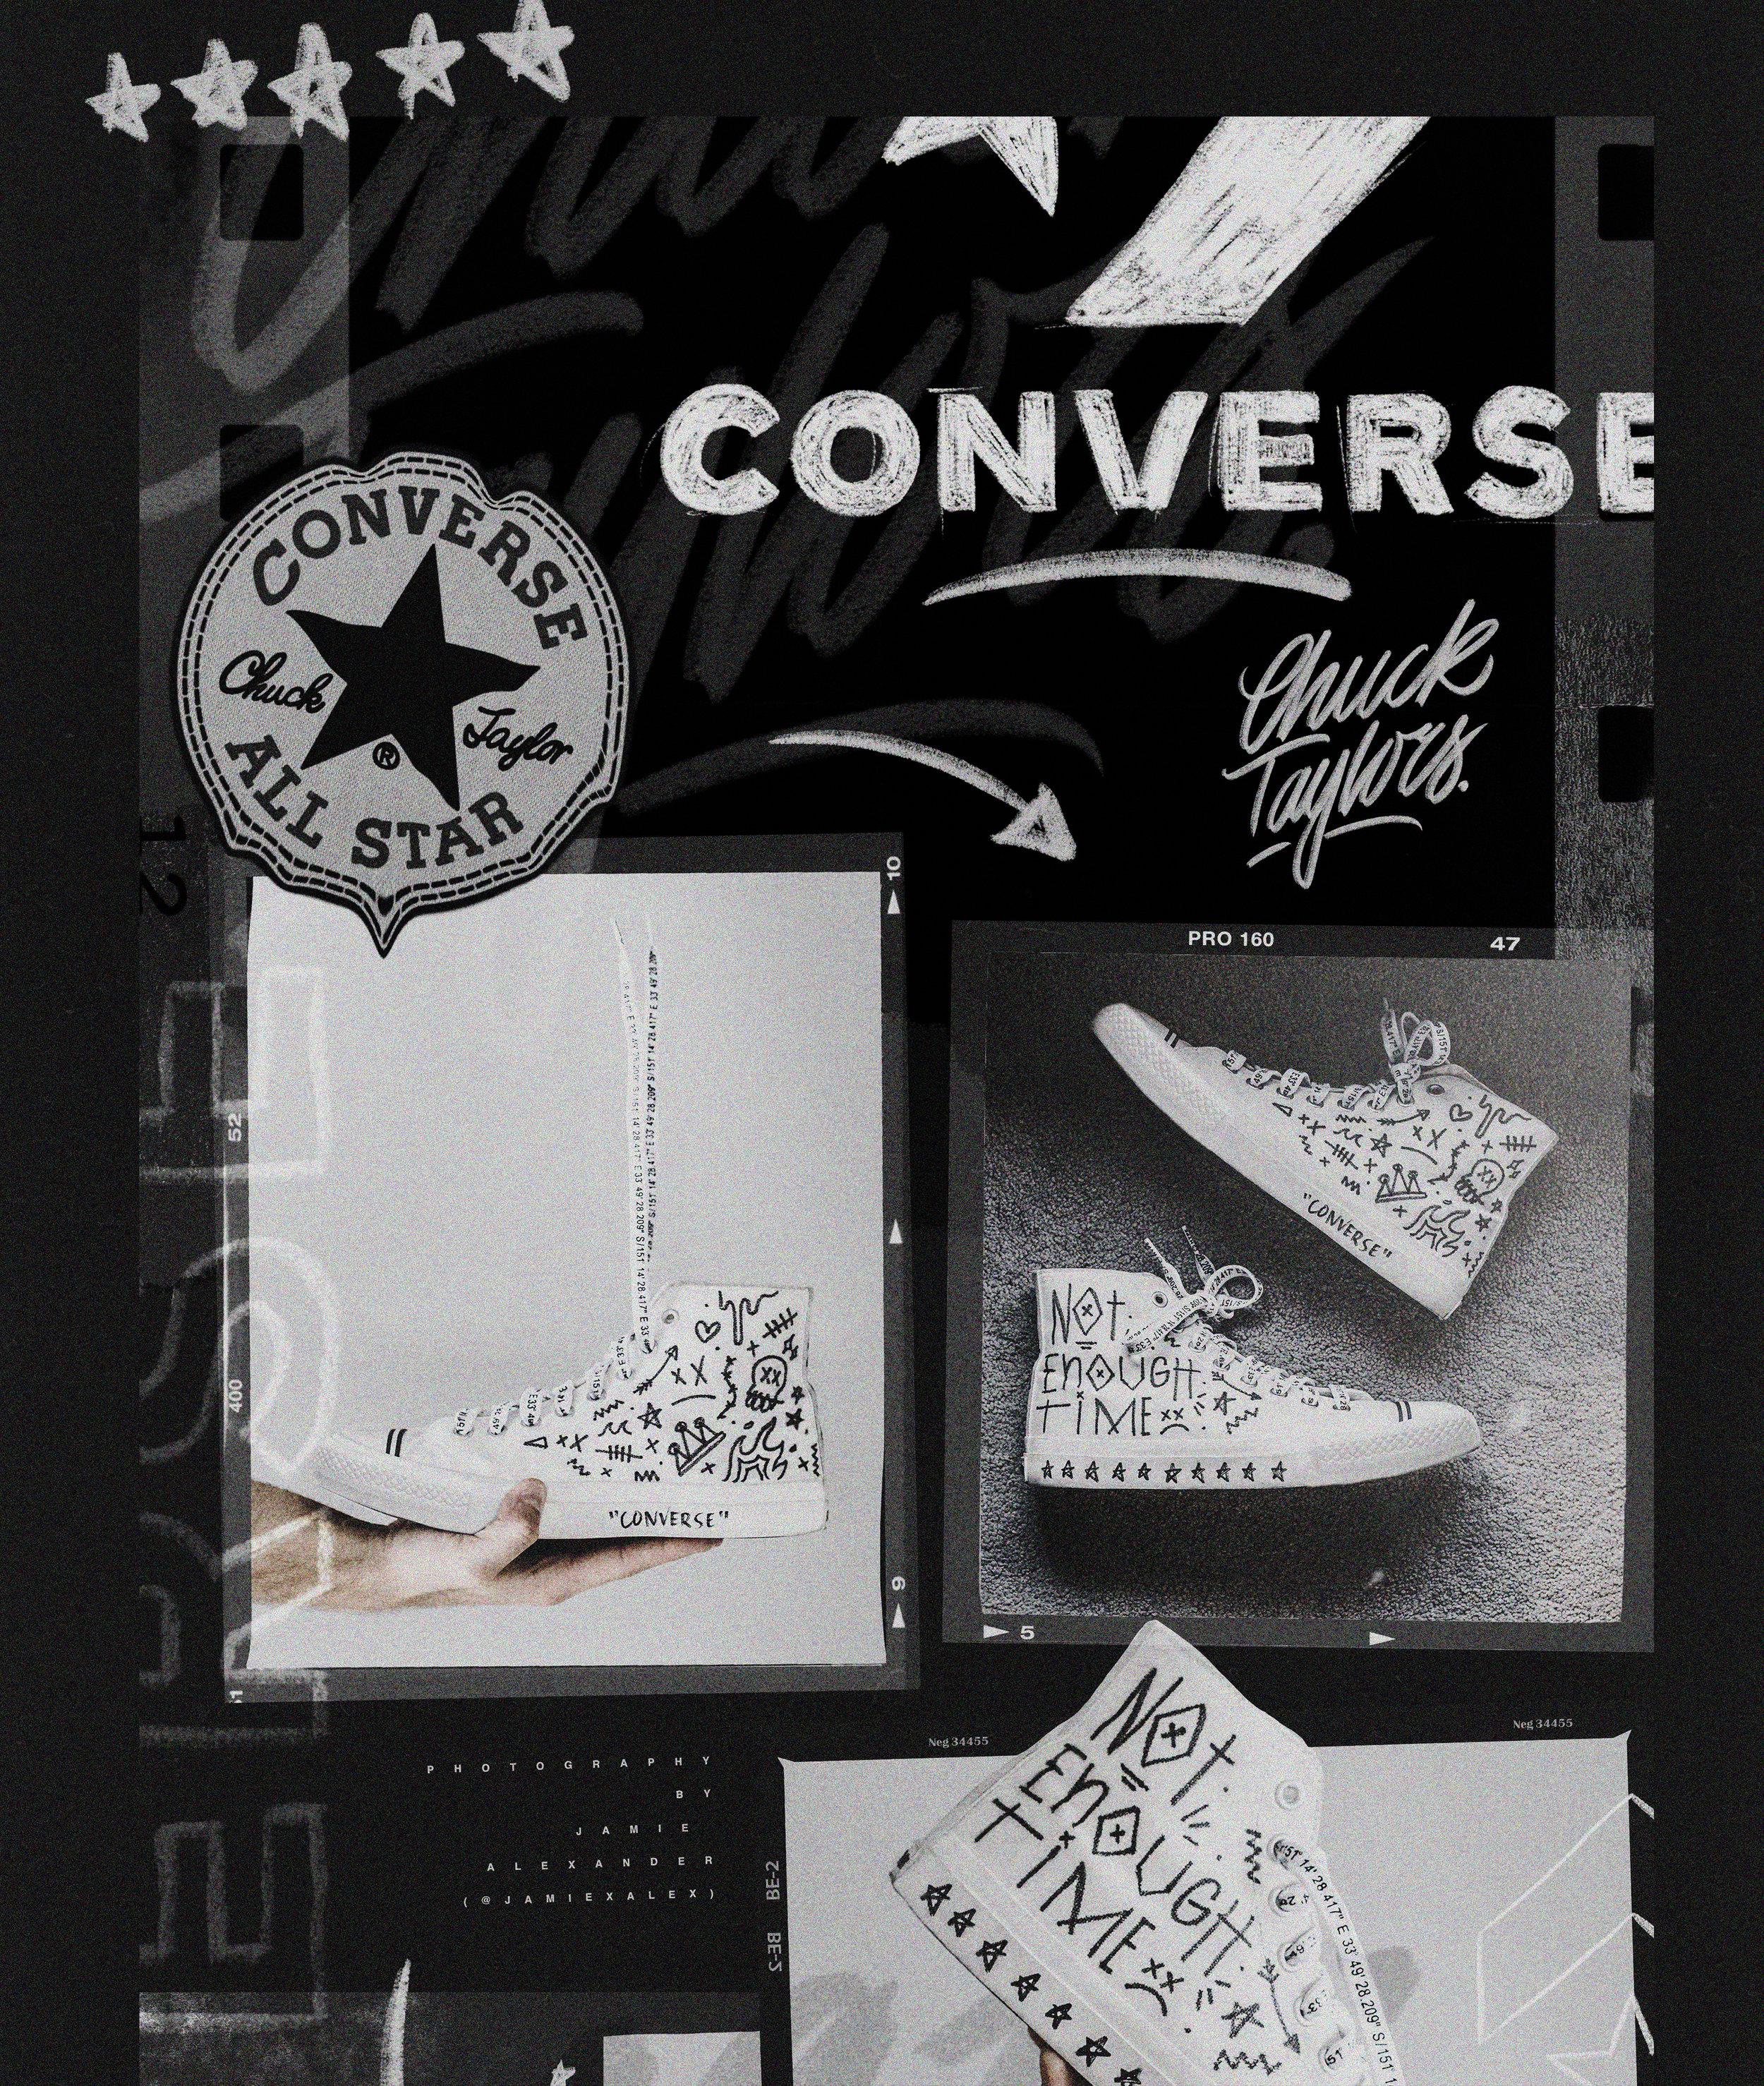 Converse-01.jpg